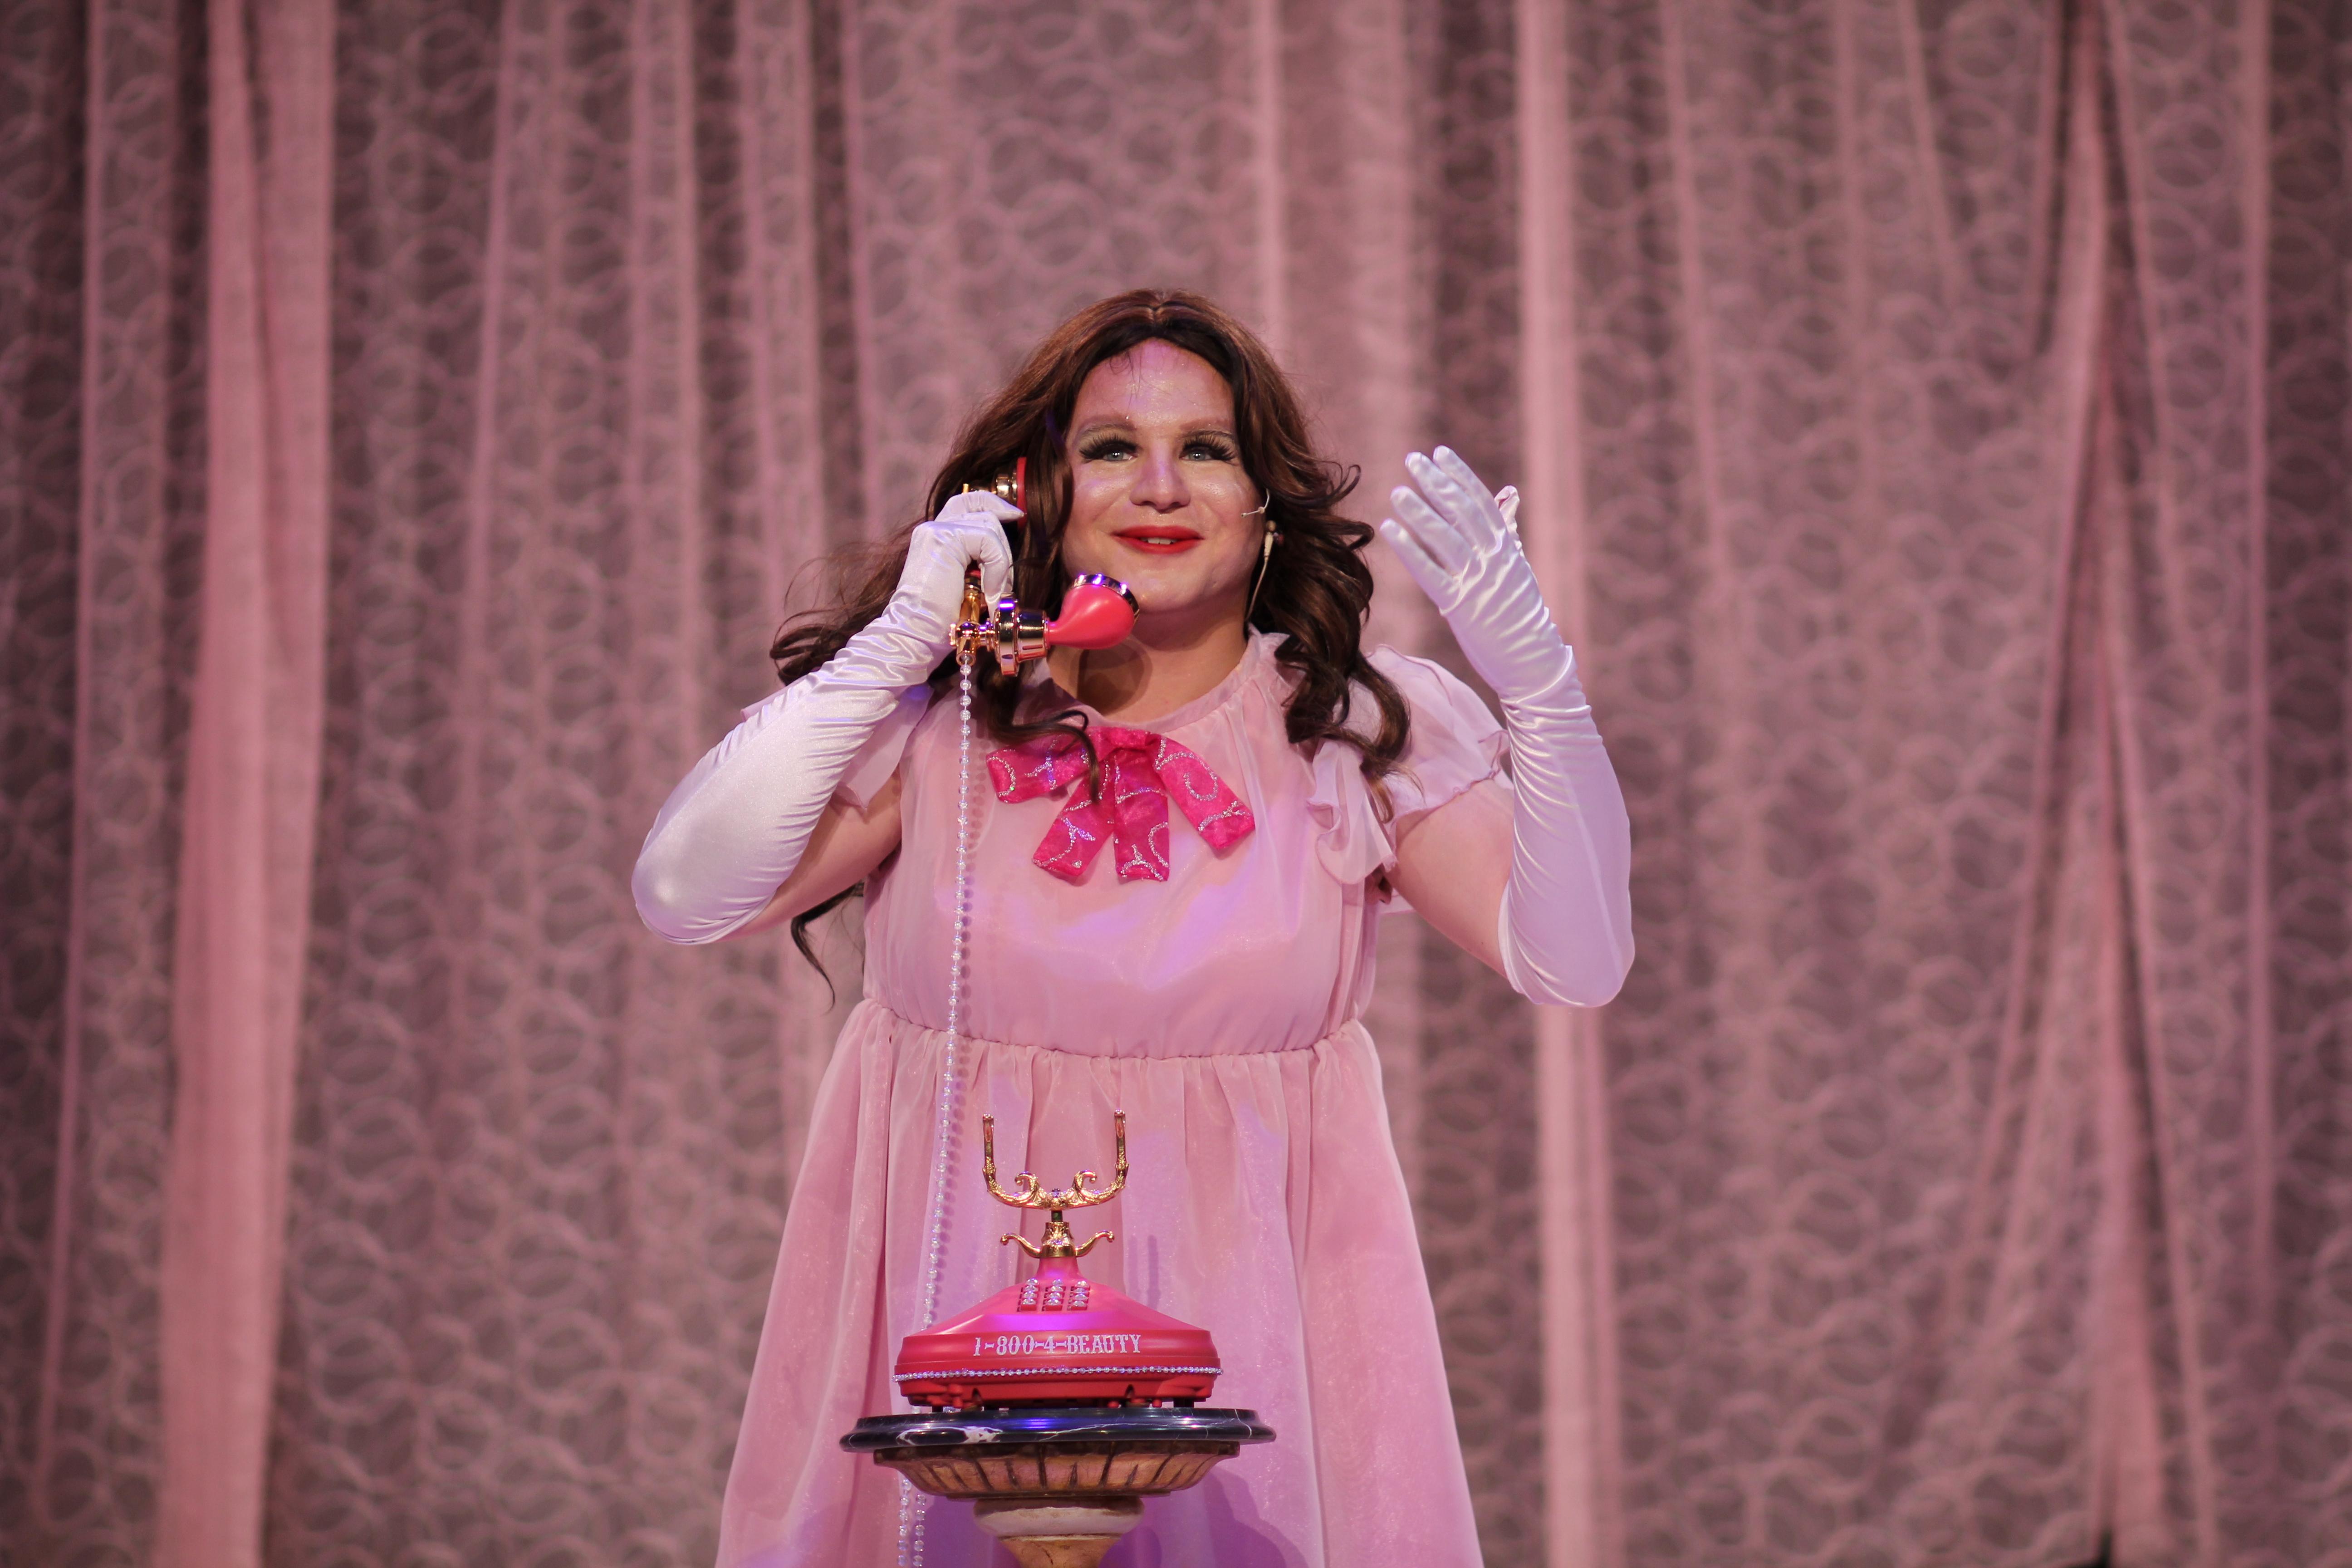 Beauty Hotline Telephone